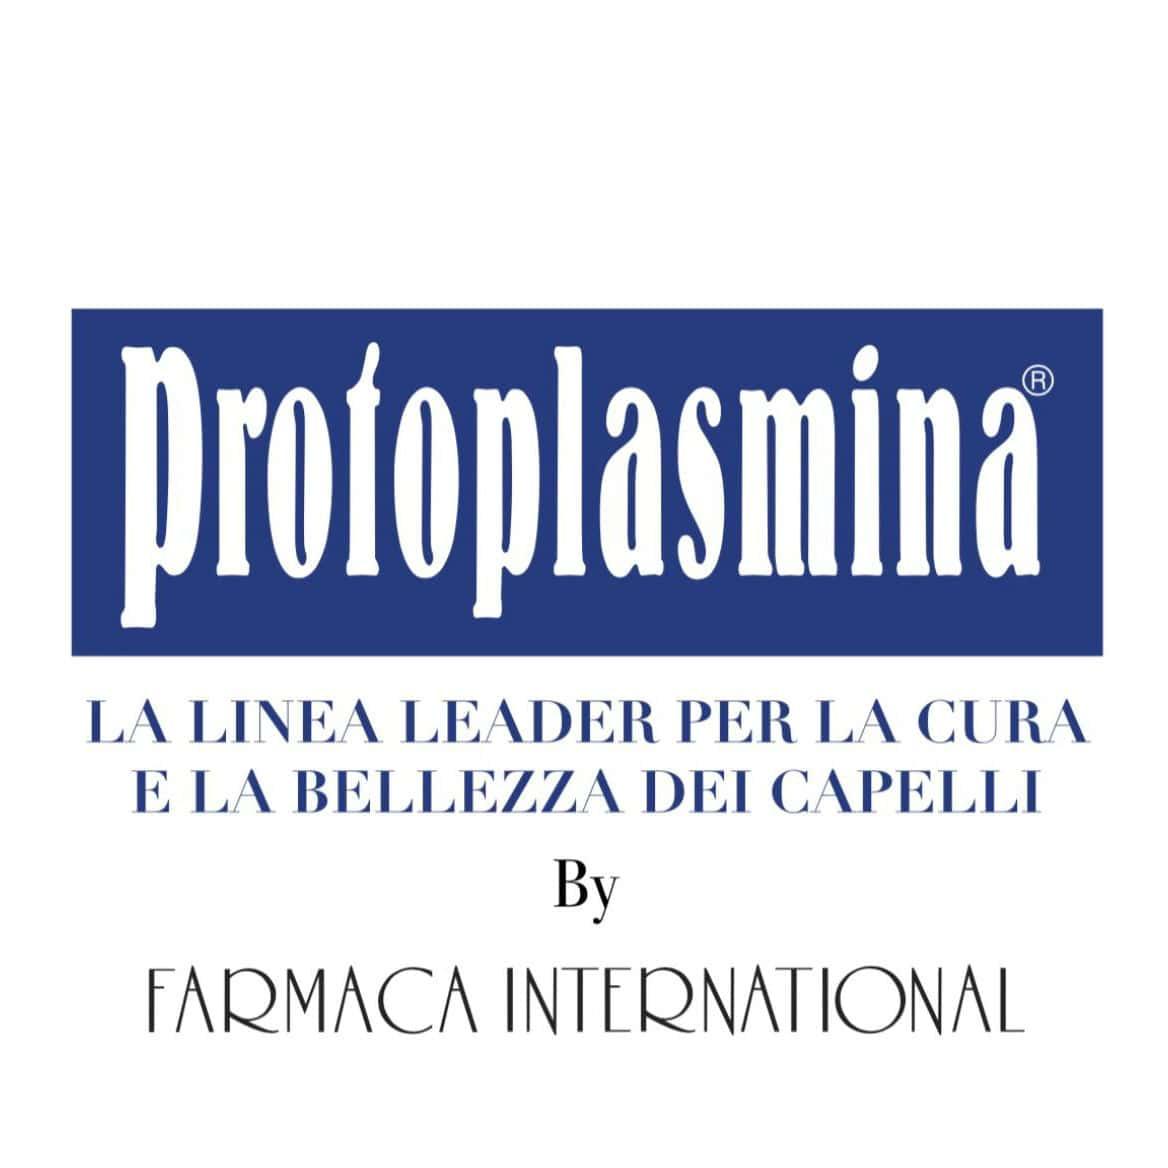 protoplasma logo